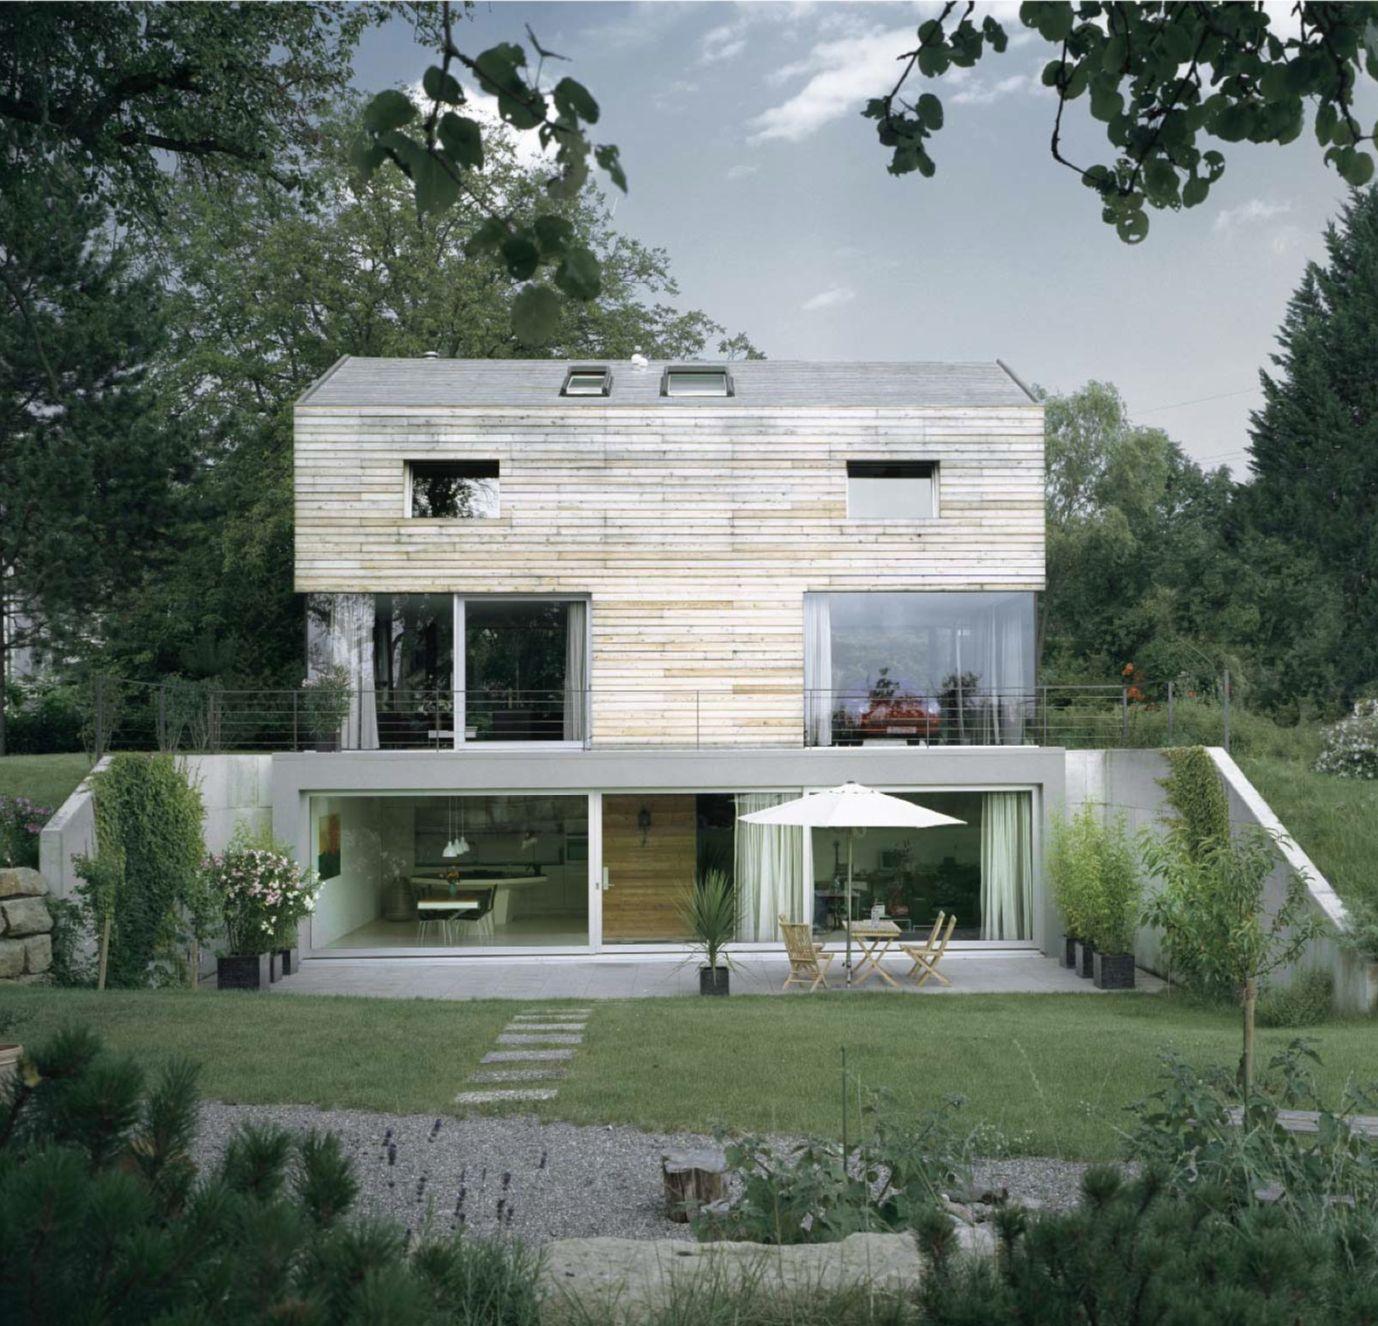 t bone house by coast houses pinterest haus architektur und schmale h user. Black Bedroom Furniture Sets. Home Design Ideas